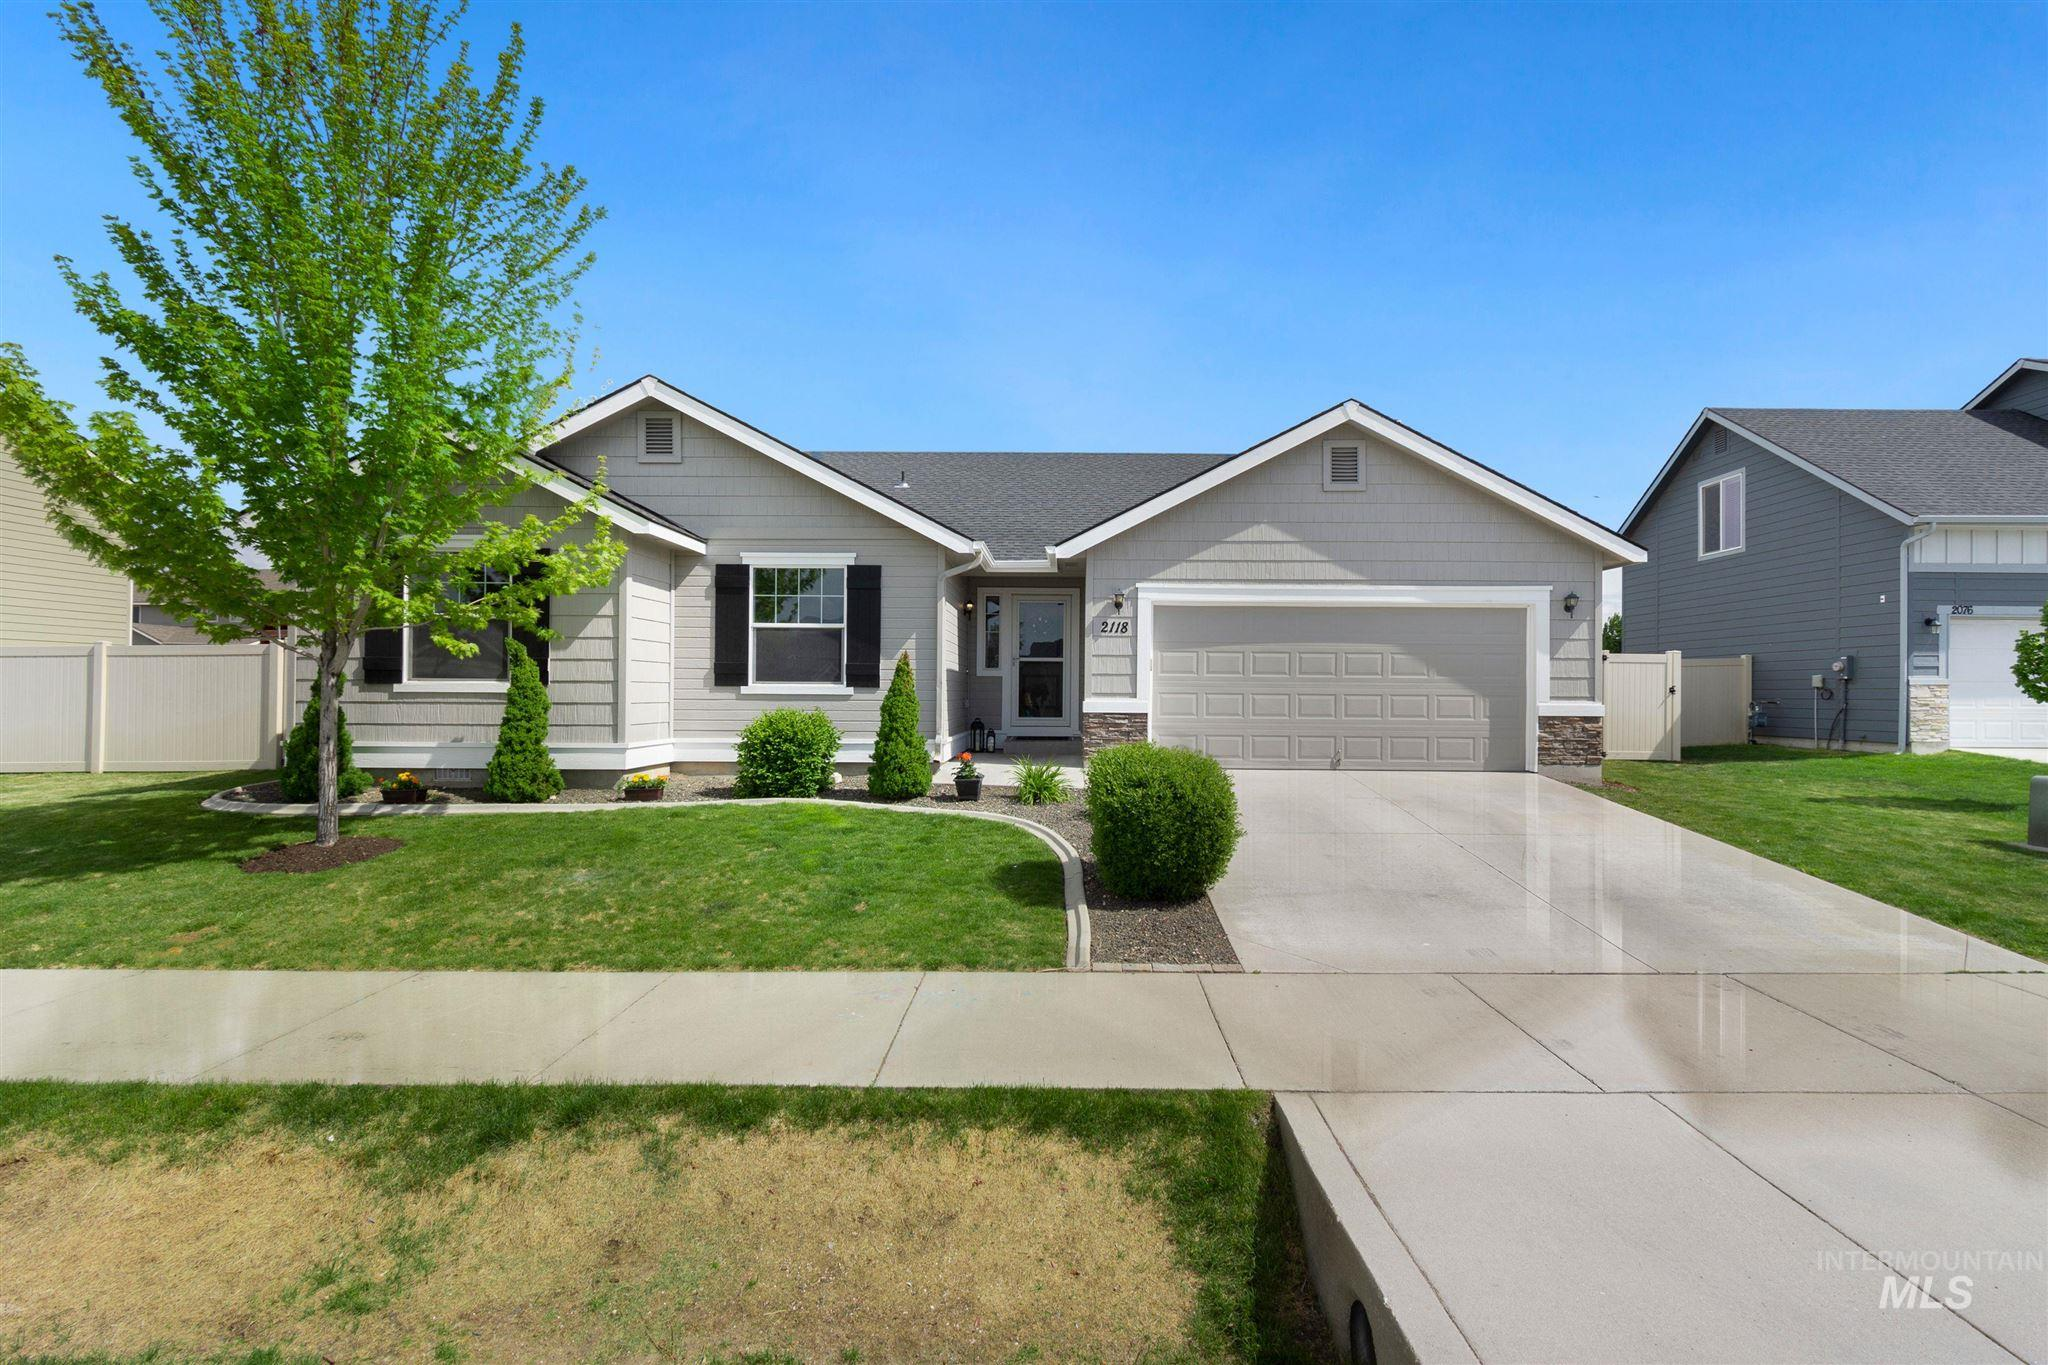 2118 W Gainsboro Property Photo - Kuna, ID real estate listing